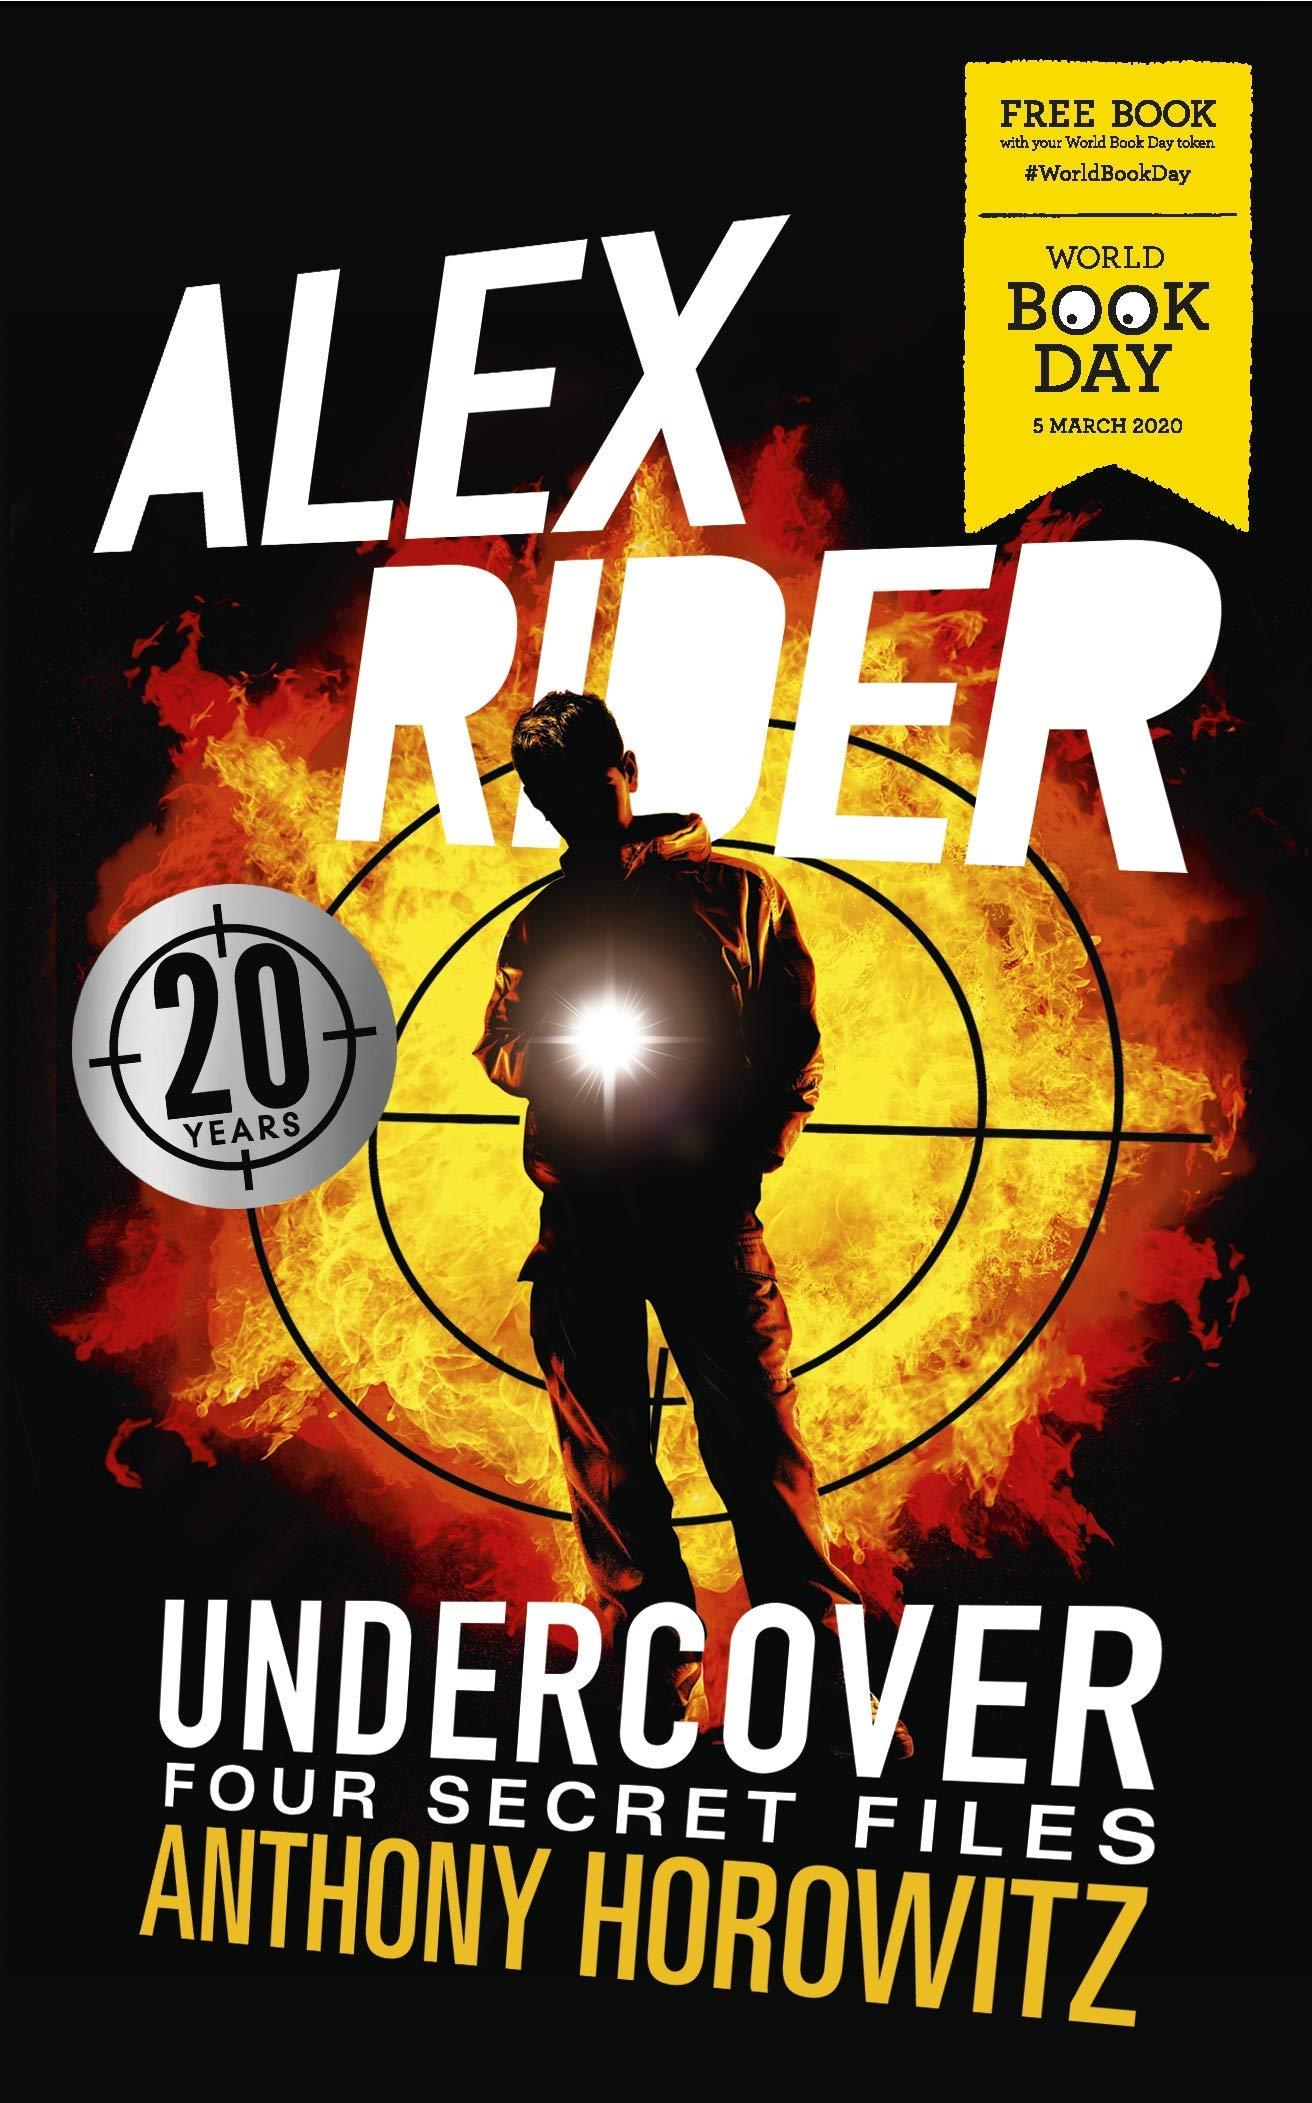 Anthony Horowitz Alex Rider Undercover: Four Secret Files - World Book Day 2020